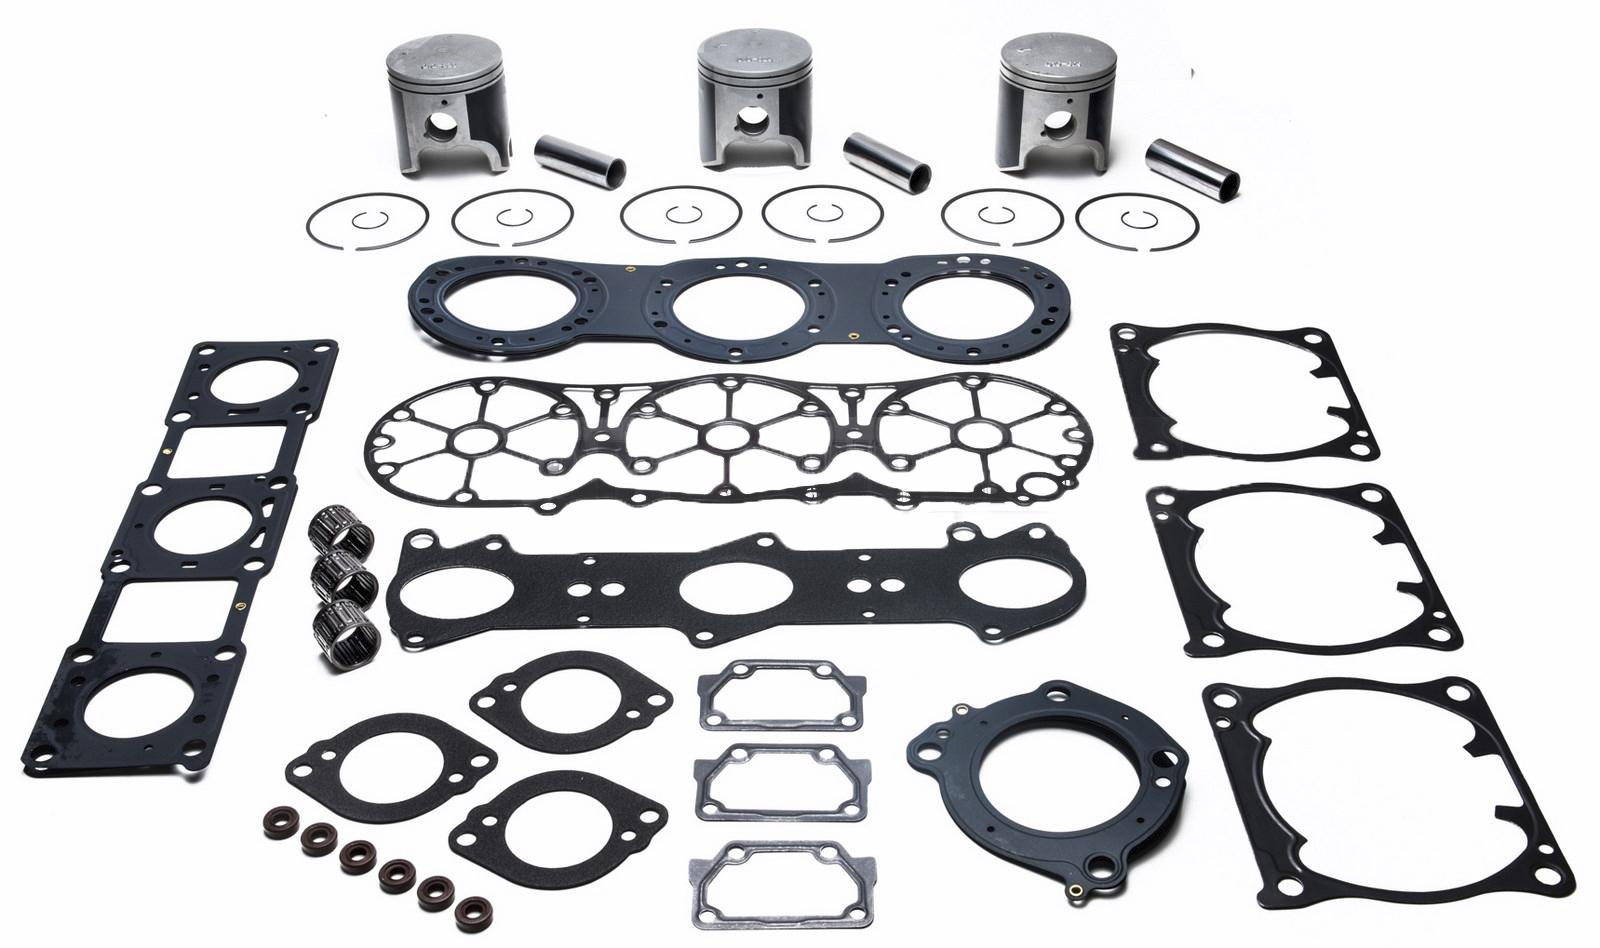 Details about Piston Gasket Top End Rebuild Kit Yamaha GP 1200R XL XLT 1200  XR1800 PV Std Bore